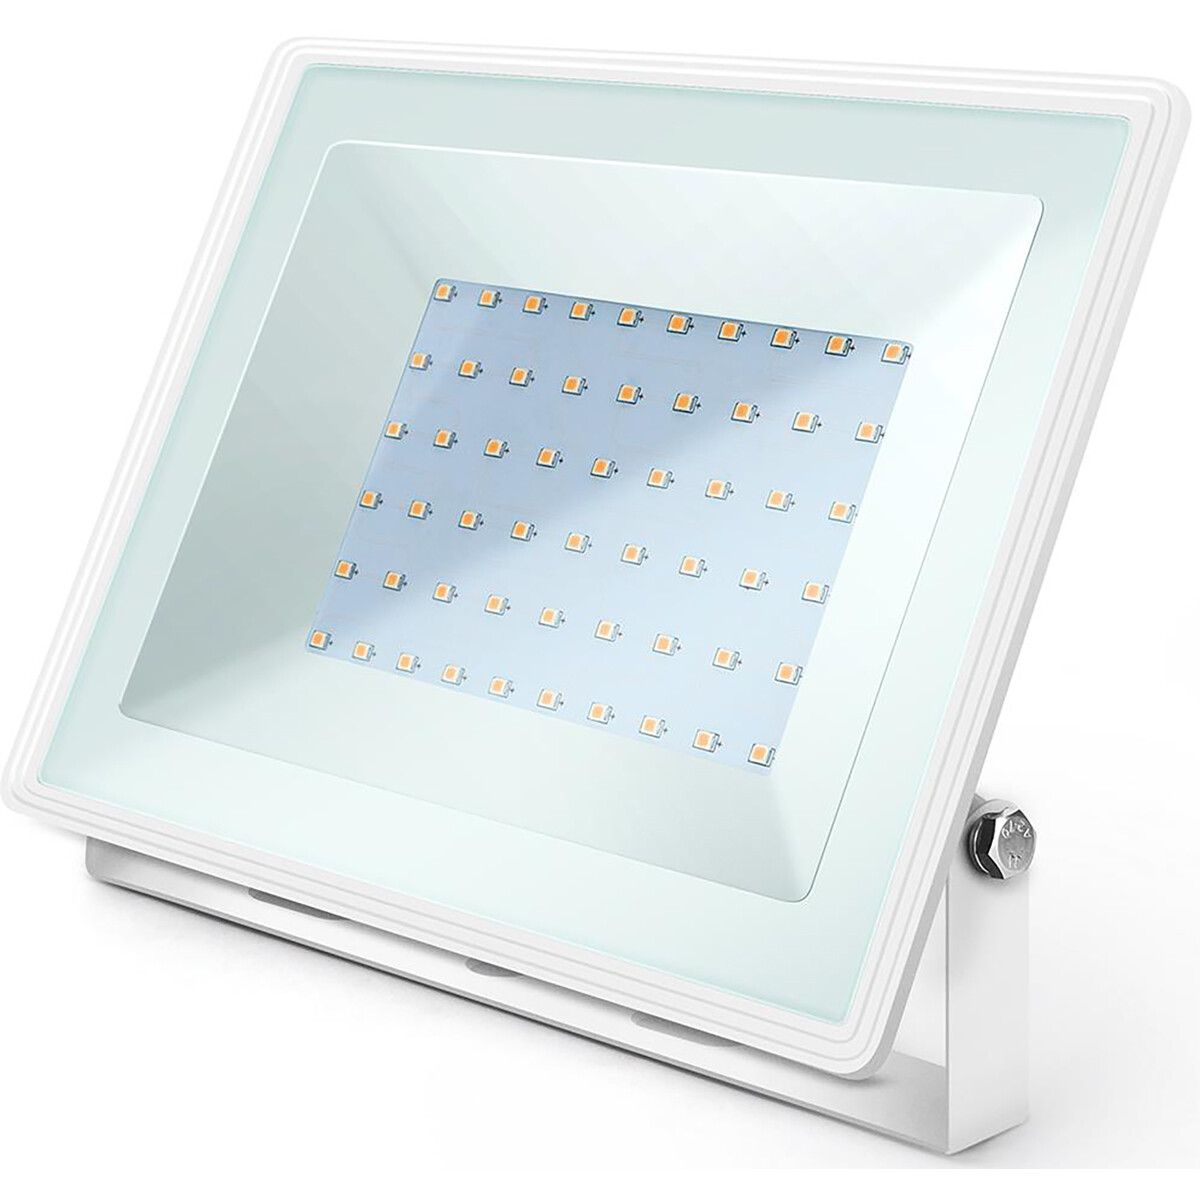 LED Bouwlamp 50 Watt - LED Schijnwerper - Aigi Iglo - Natuurlijk Wit 4000K - Waterdicht IP65 - Mat Wit - Aluminium